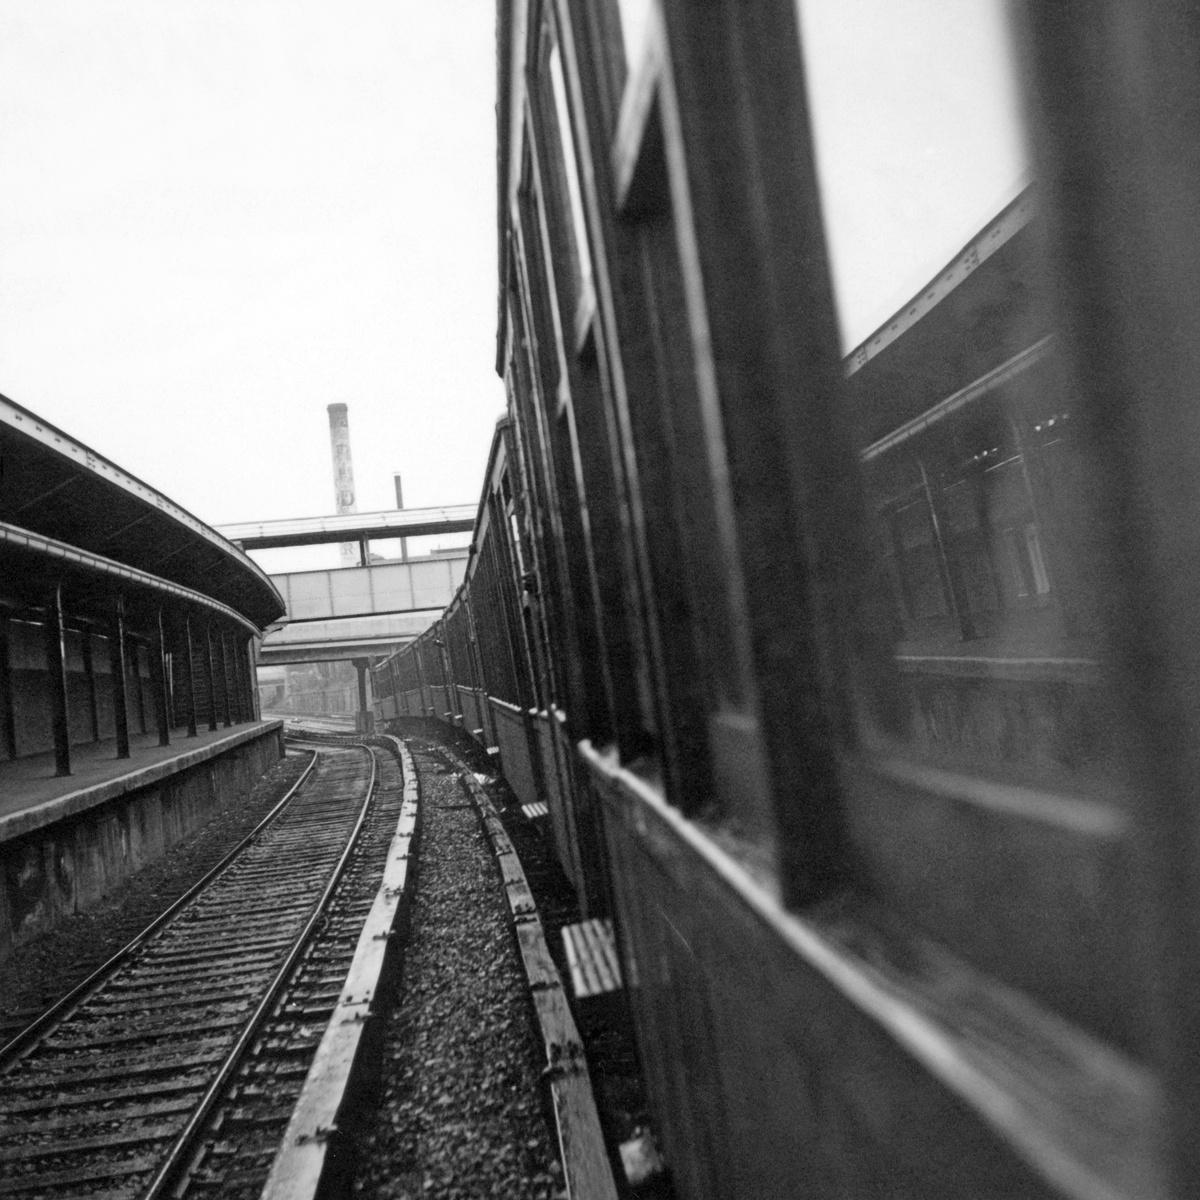 (476k, 1200x1200)<br><b>Country:</b> United States<br><b>City:</b> New York<br><b>System:</b> New York City Transit<br><b>Line:</b> BMT Sea Beach Line<br><b>Location:</b> 8th Avenue<br><b>Route:</b> Fan Trip<br><b>Car:</b> BMT Q  <br><b>Collection of:</b> David Pirmann<br><b>Date:</b> 4/19/1964<br><b>Viewed (this week/total):</b> 0 / 1105